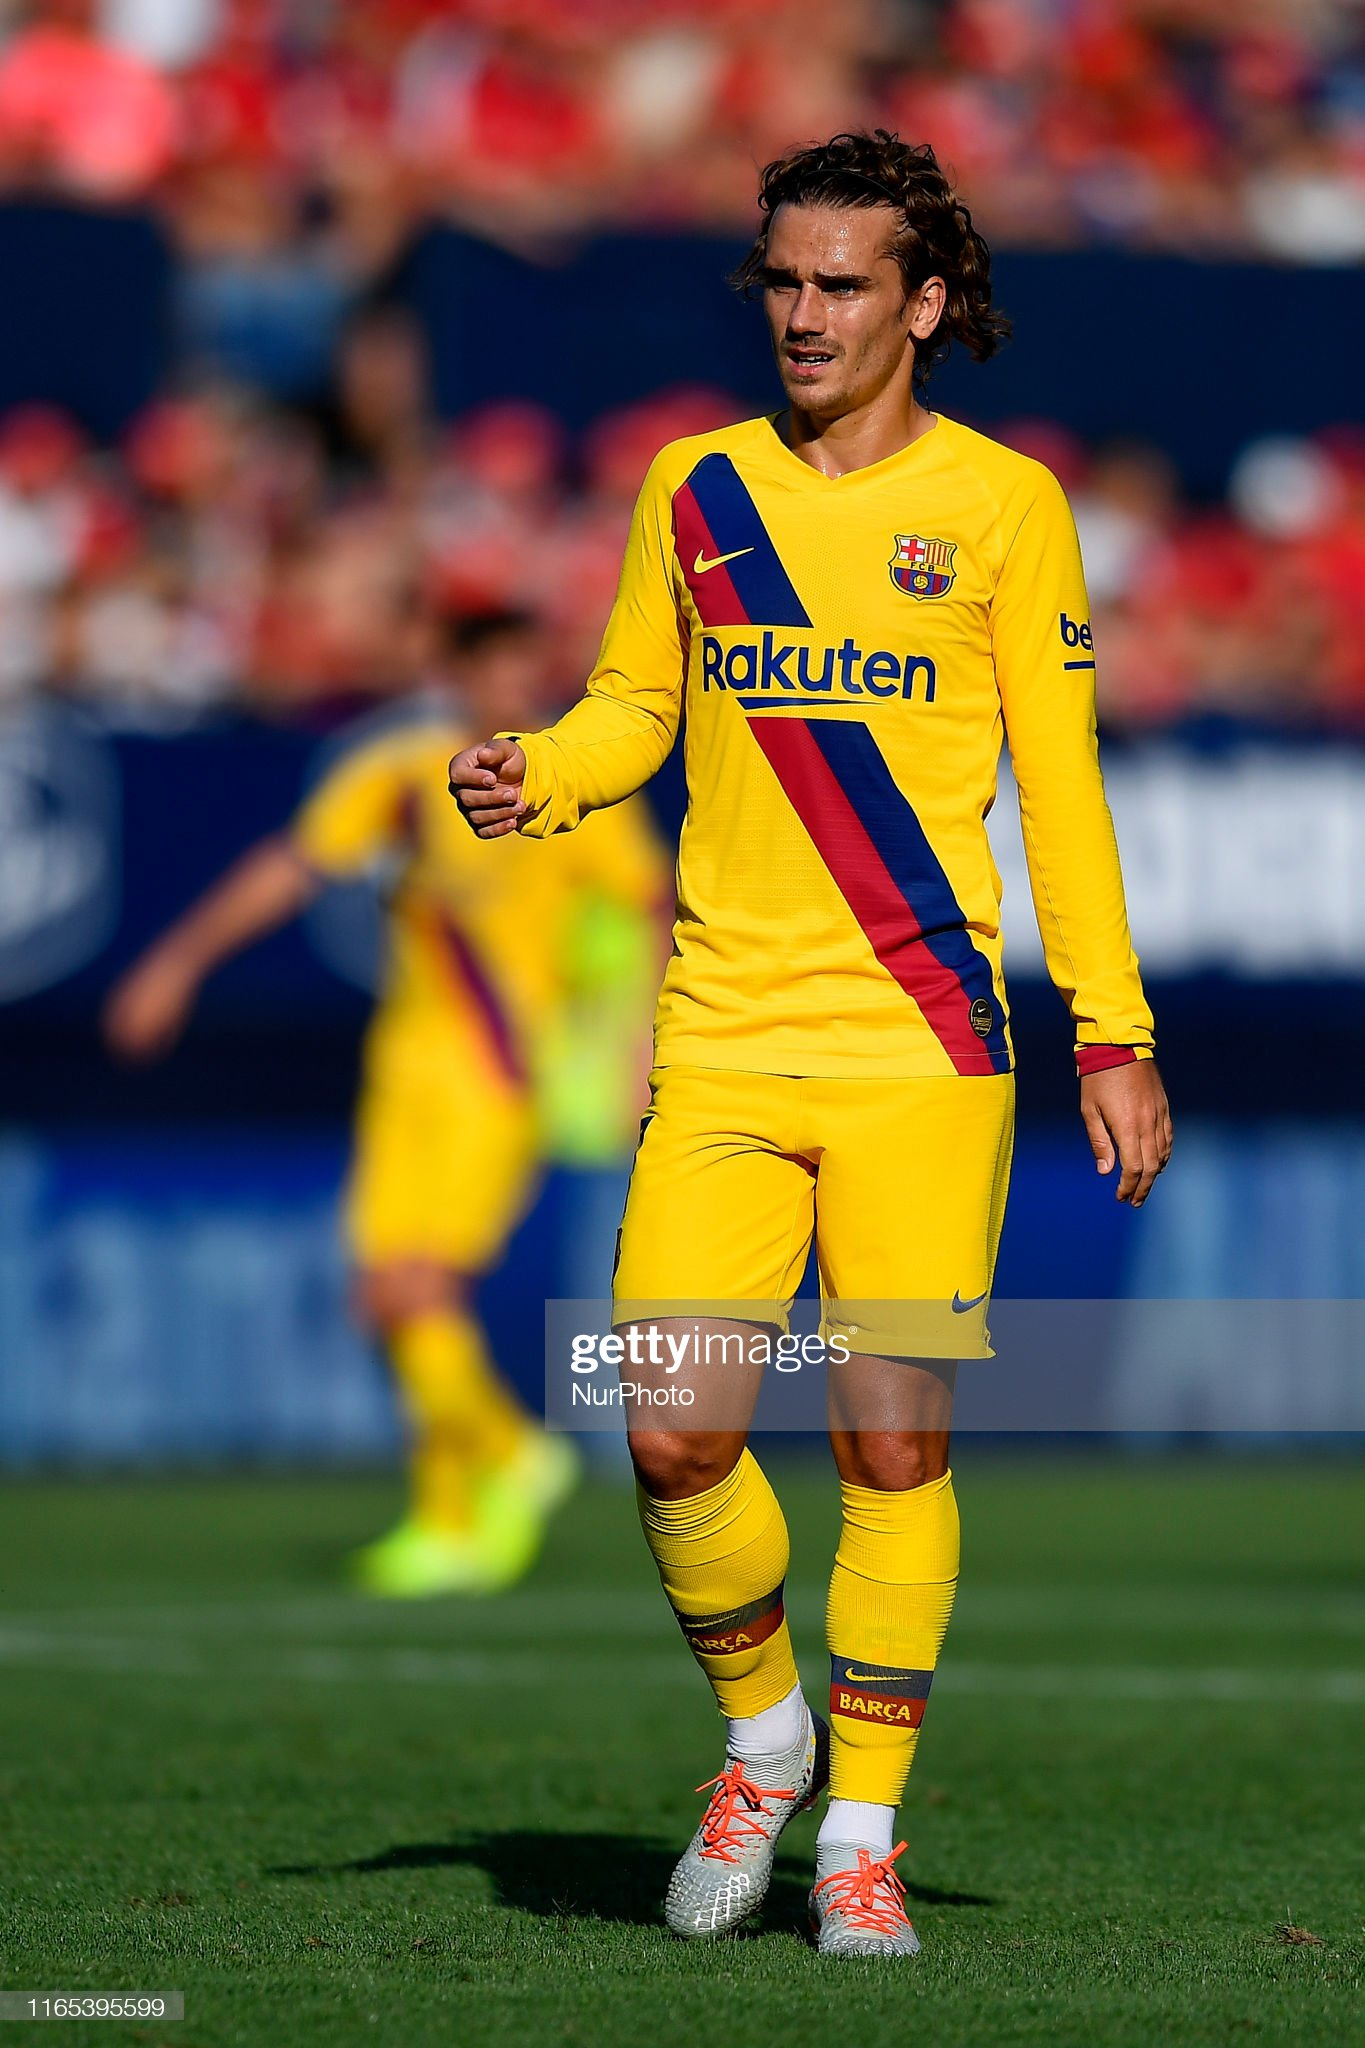 صور مباراة : أوساسونا - برشلونة 2-2 ( 31-08-2019 )  Antoine-griezmann-of-barcelona-during-the-liga-match-between-ca-and-picture-id1165395599?s=2048x2048